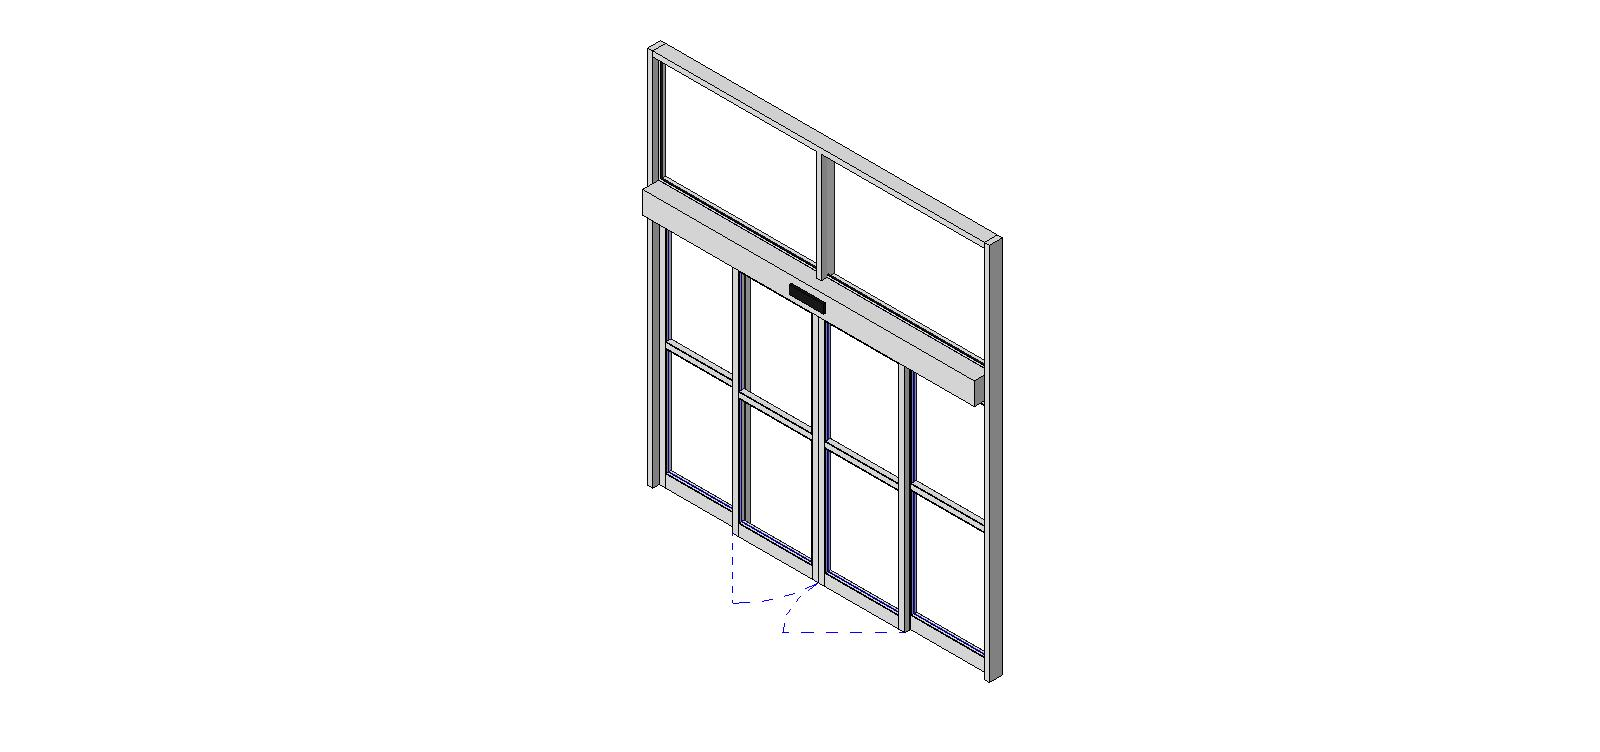 Bim objects families for Sliding window wall